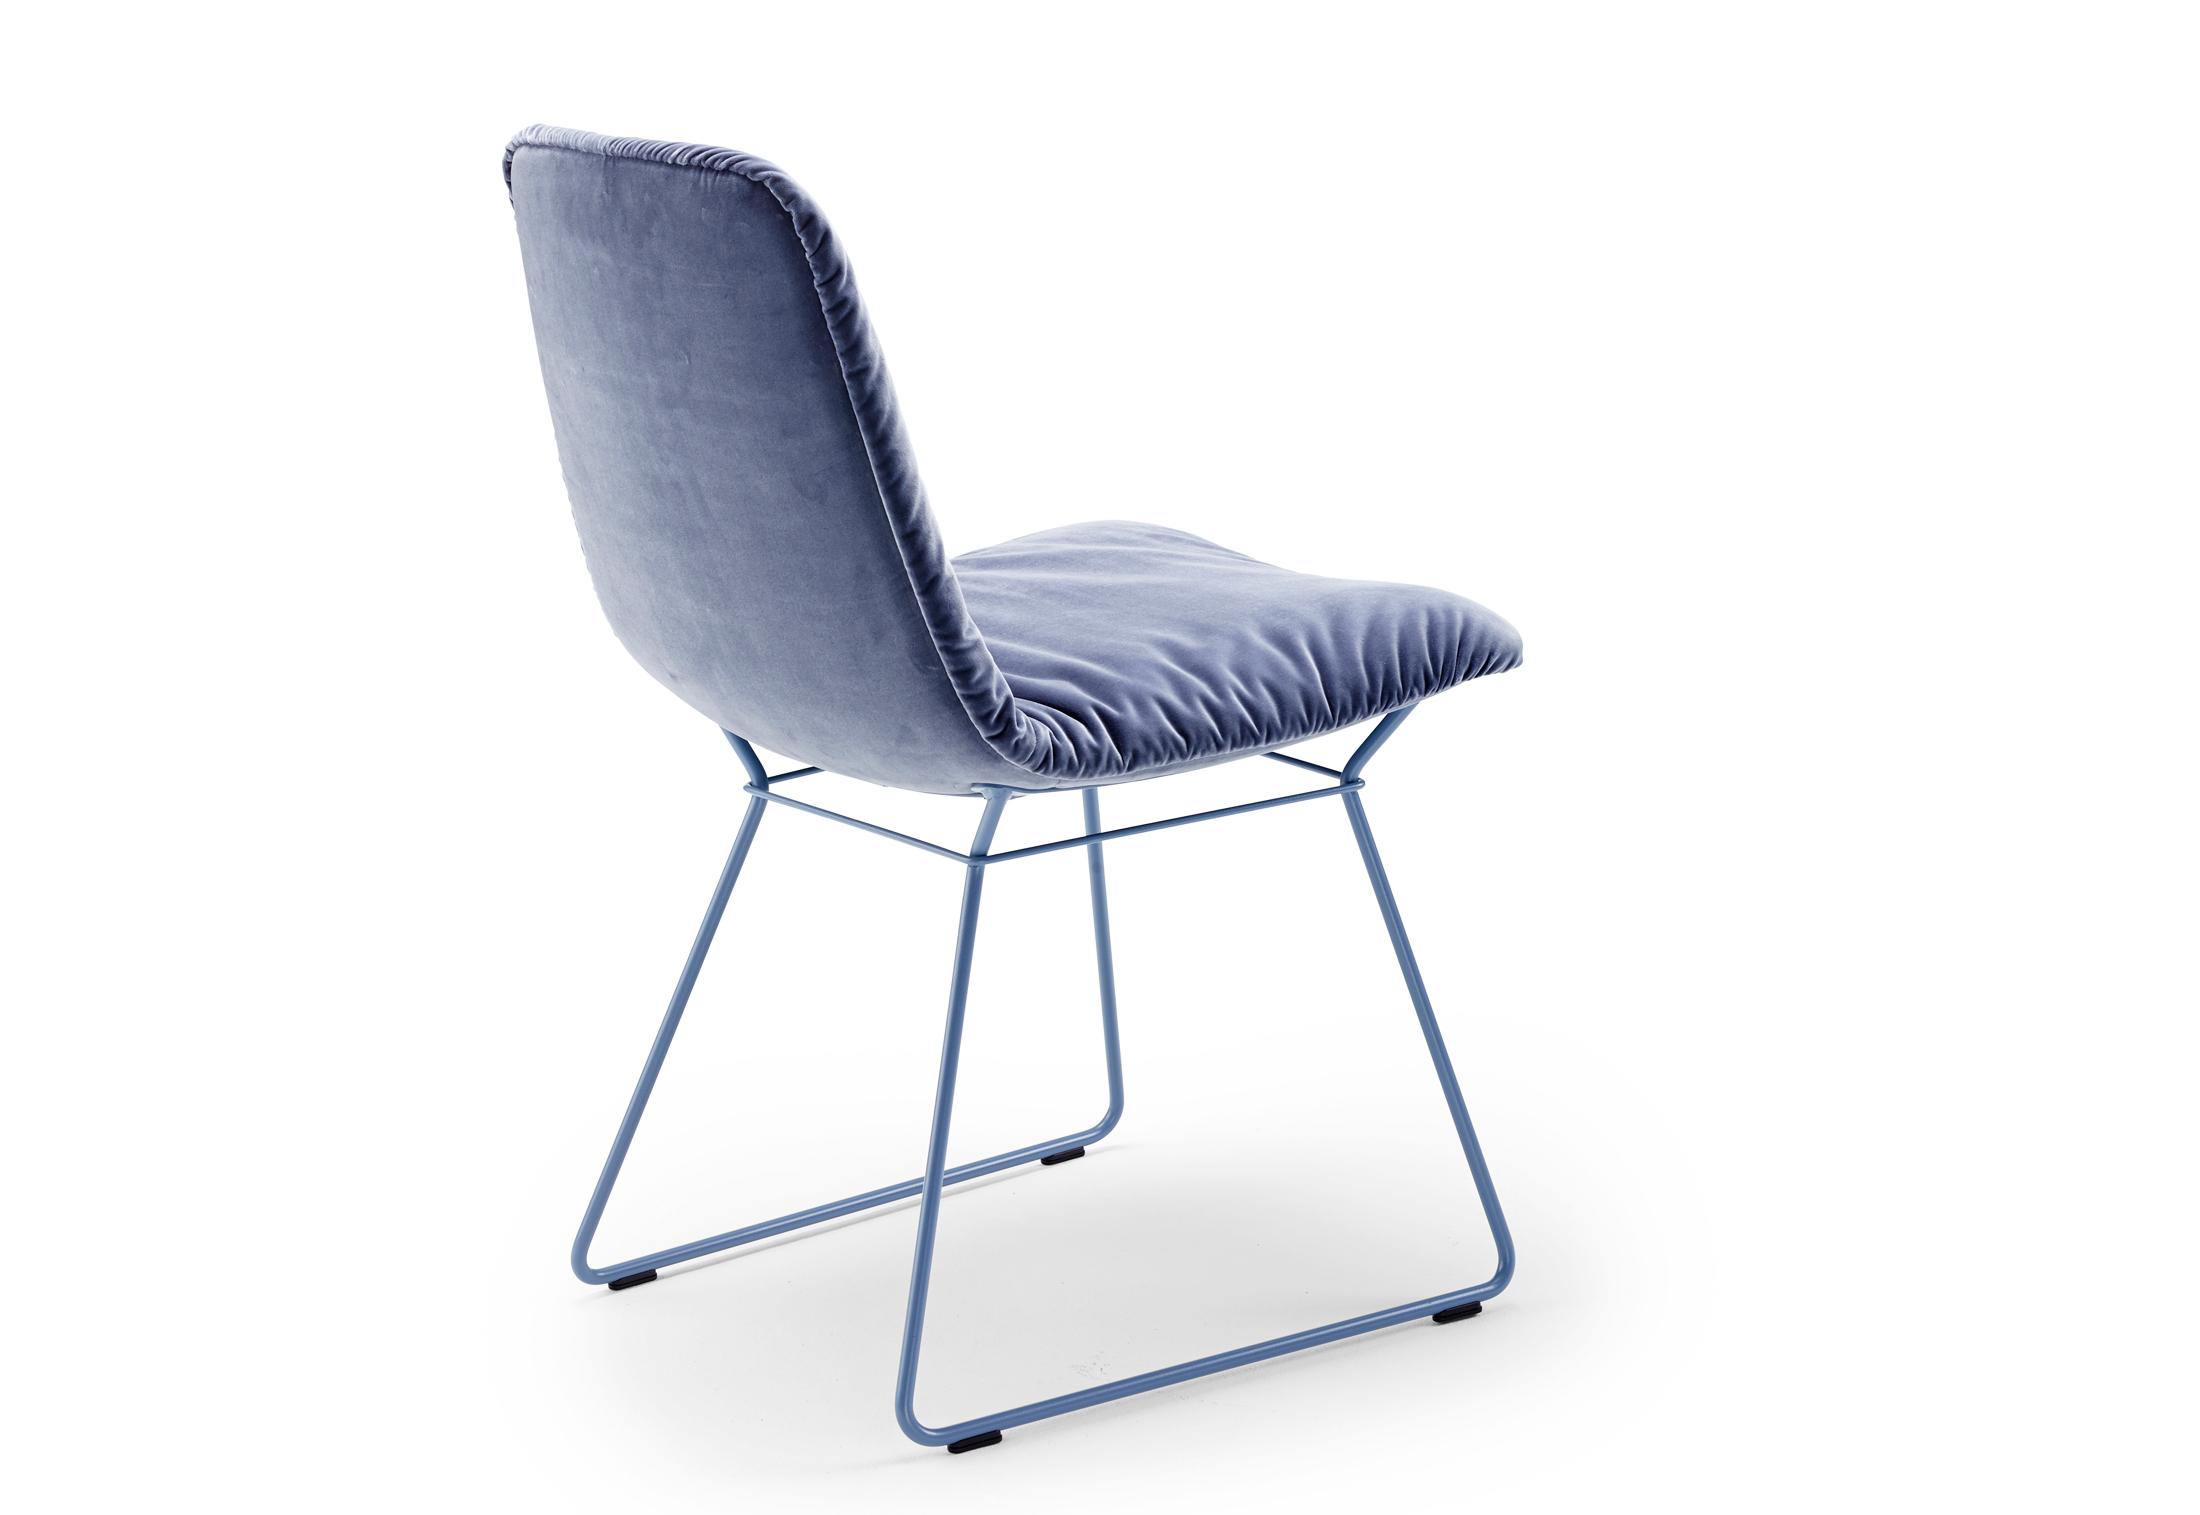 Leya chair with wire frame by Freifrau   STYLEPARK